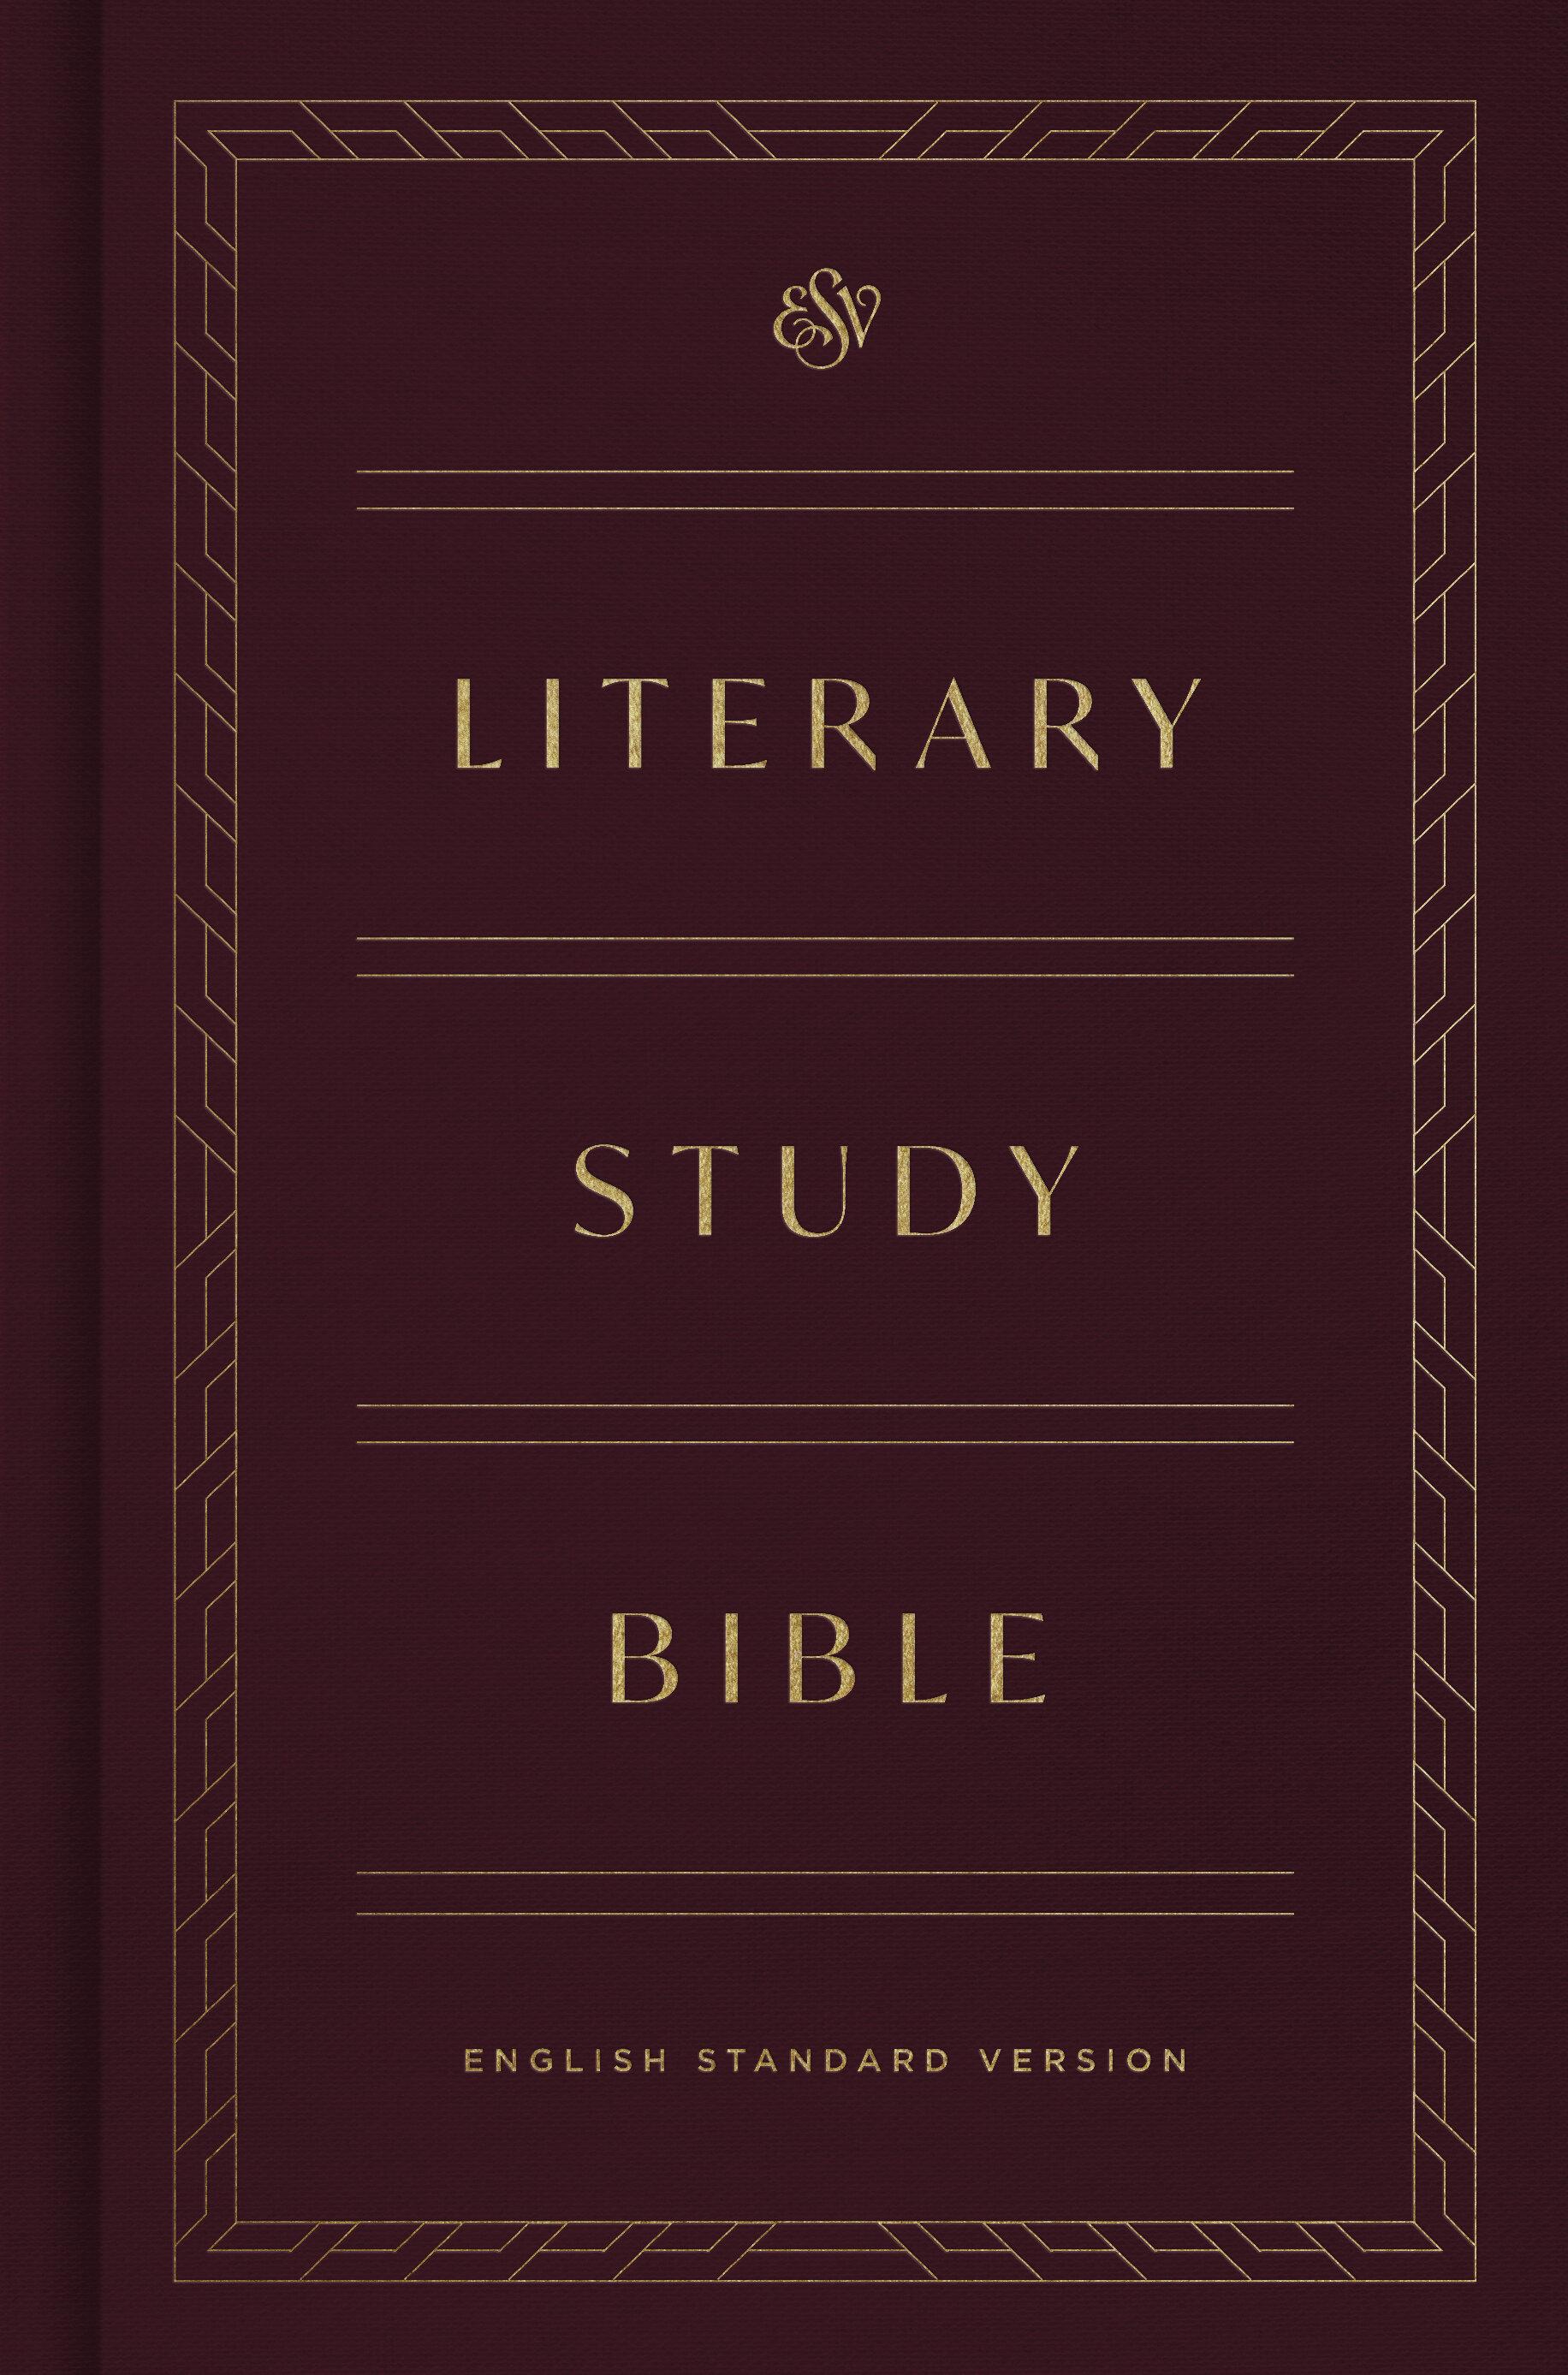 ESV Literary Study Bible Notes